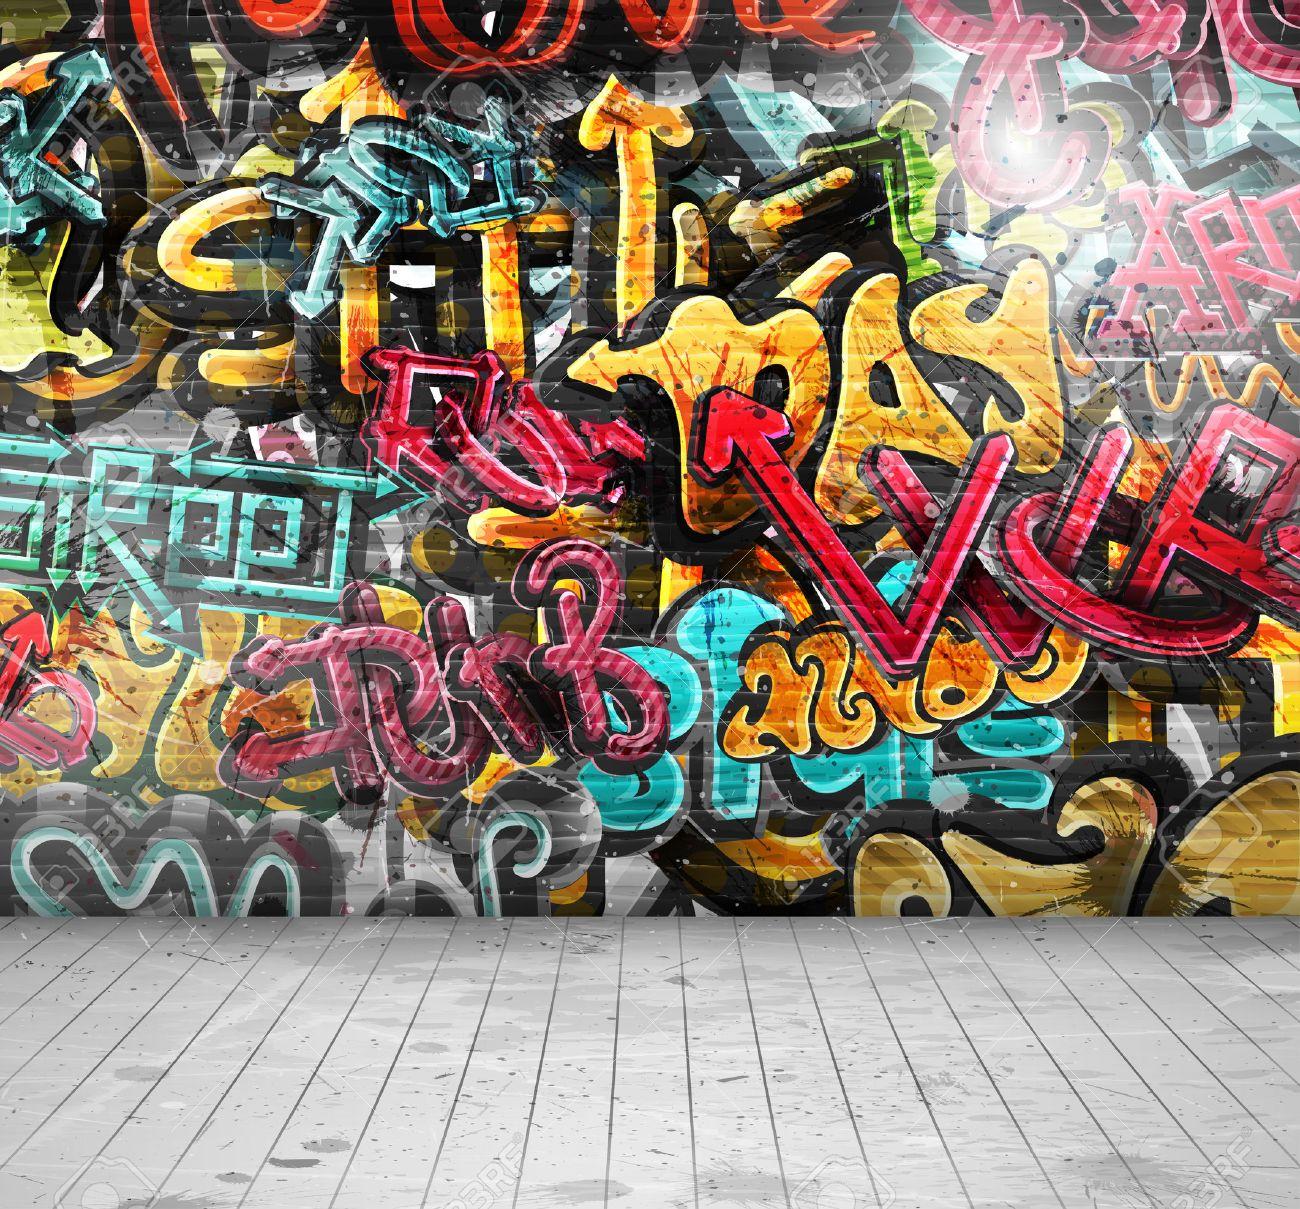 Graffiti wall vector free - Graffiti Wall Graffiti On Wall Eps 10